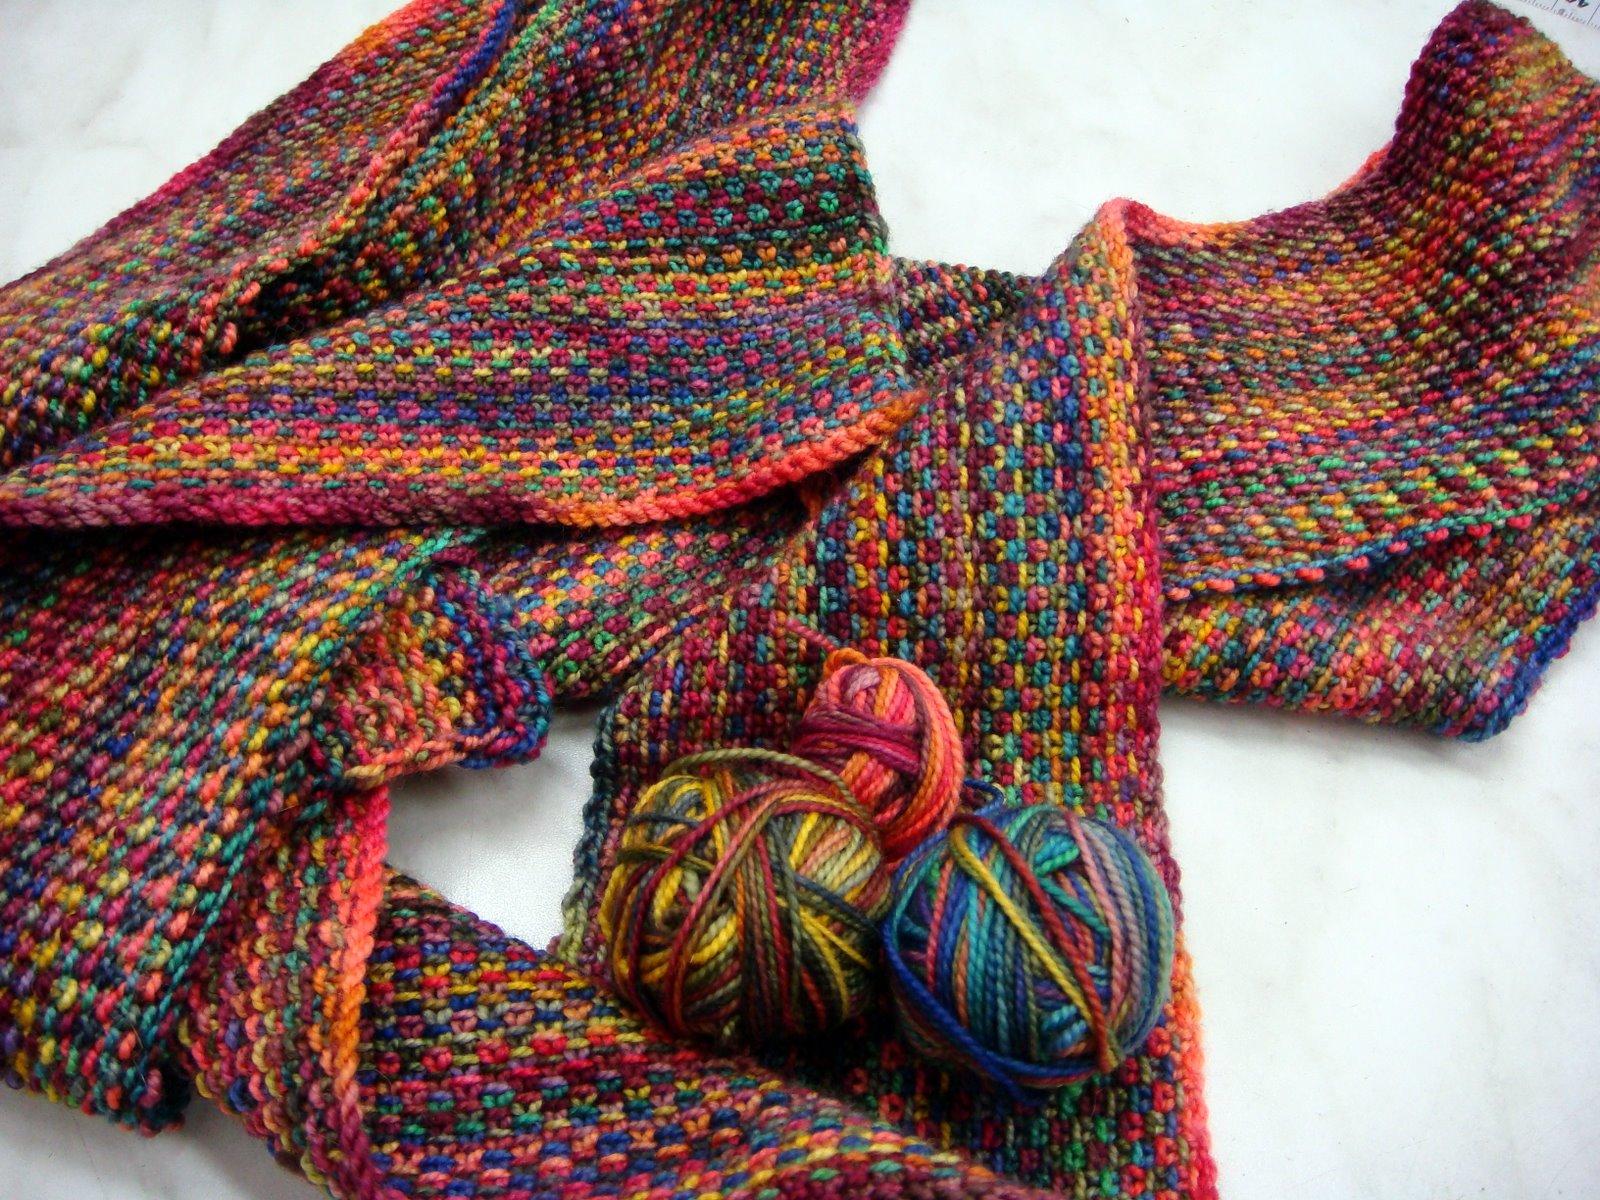 Wills Wools: Koigu Linnen steek Sjaal / Linen Stitch Scarf